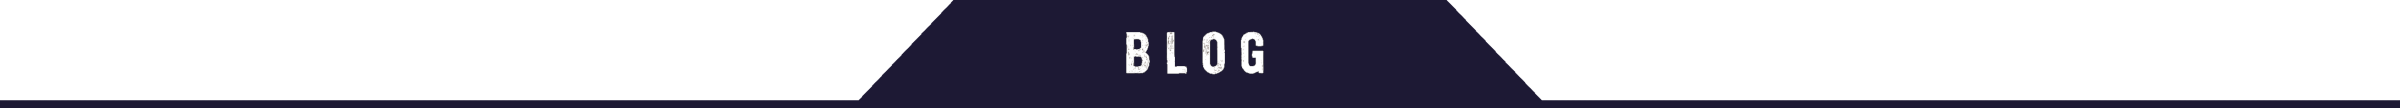 blog recent posts